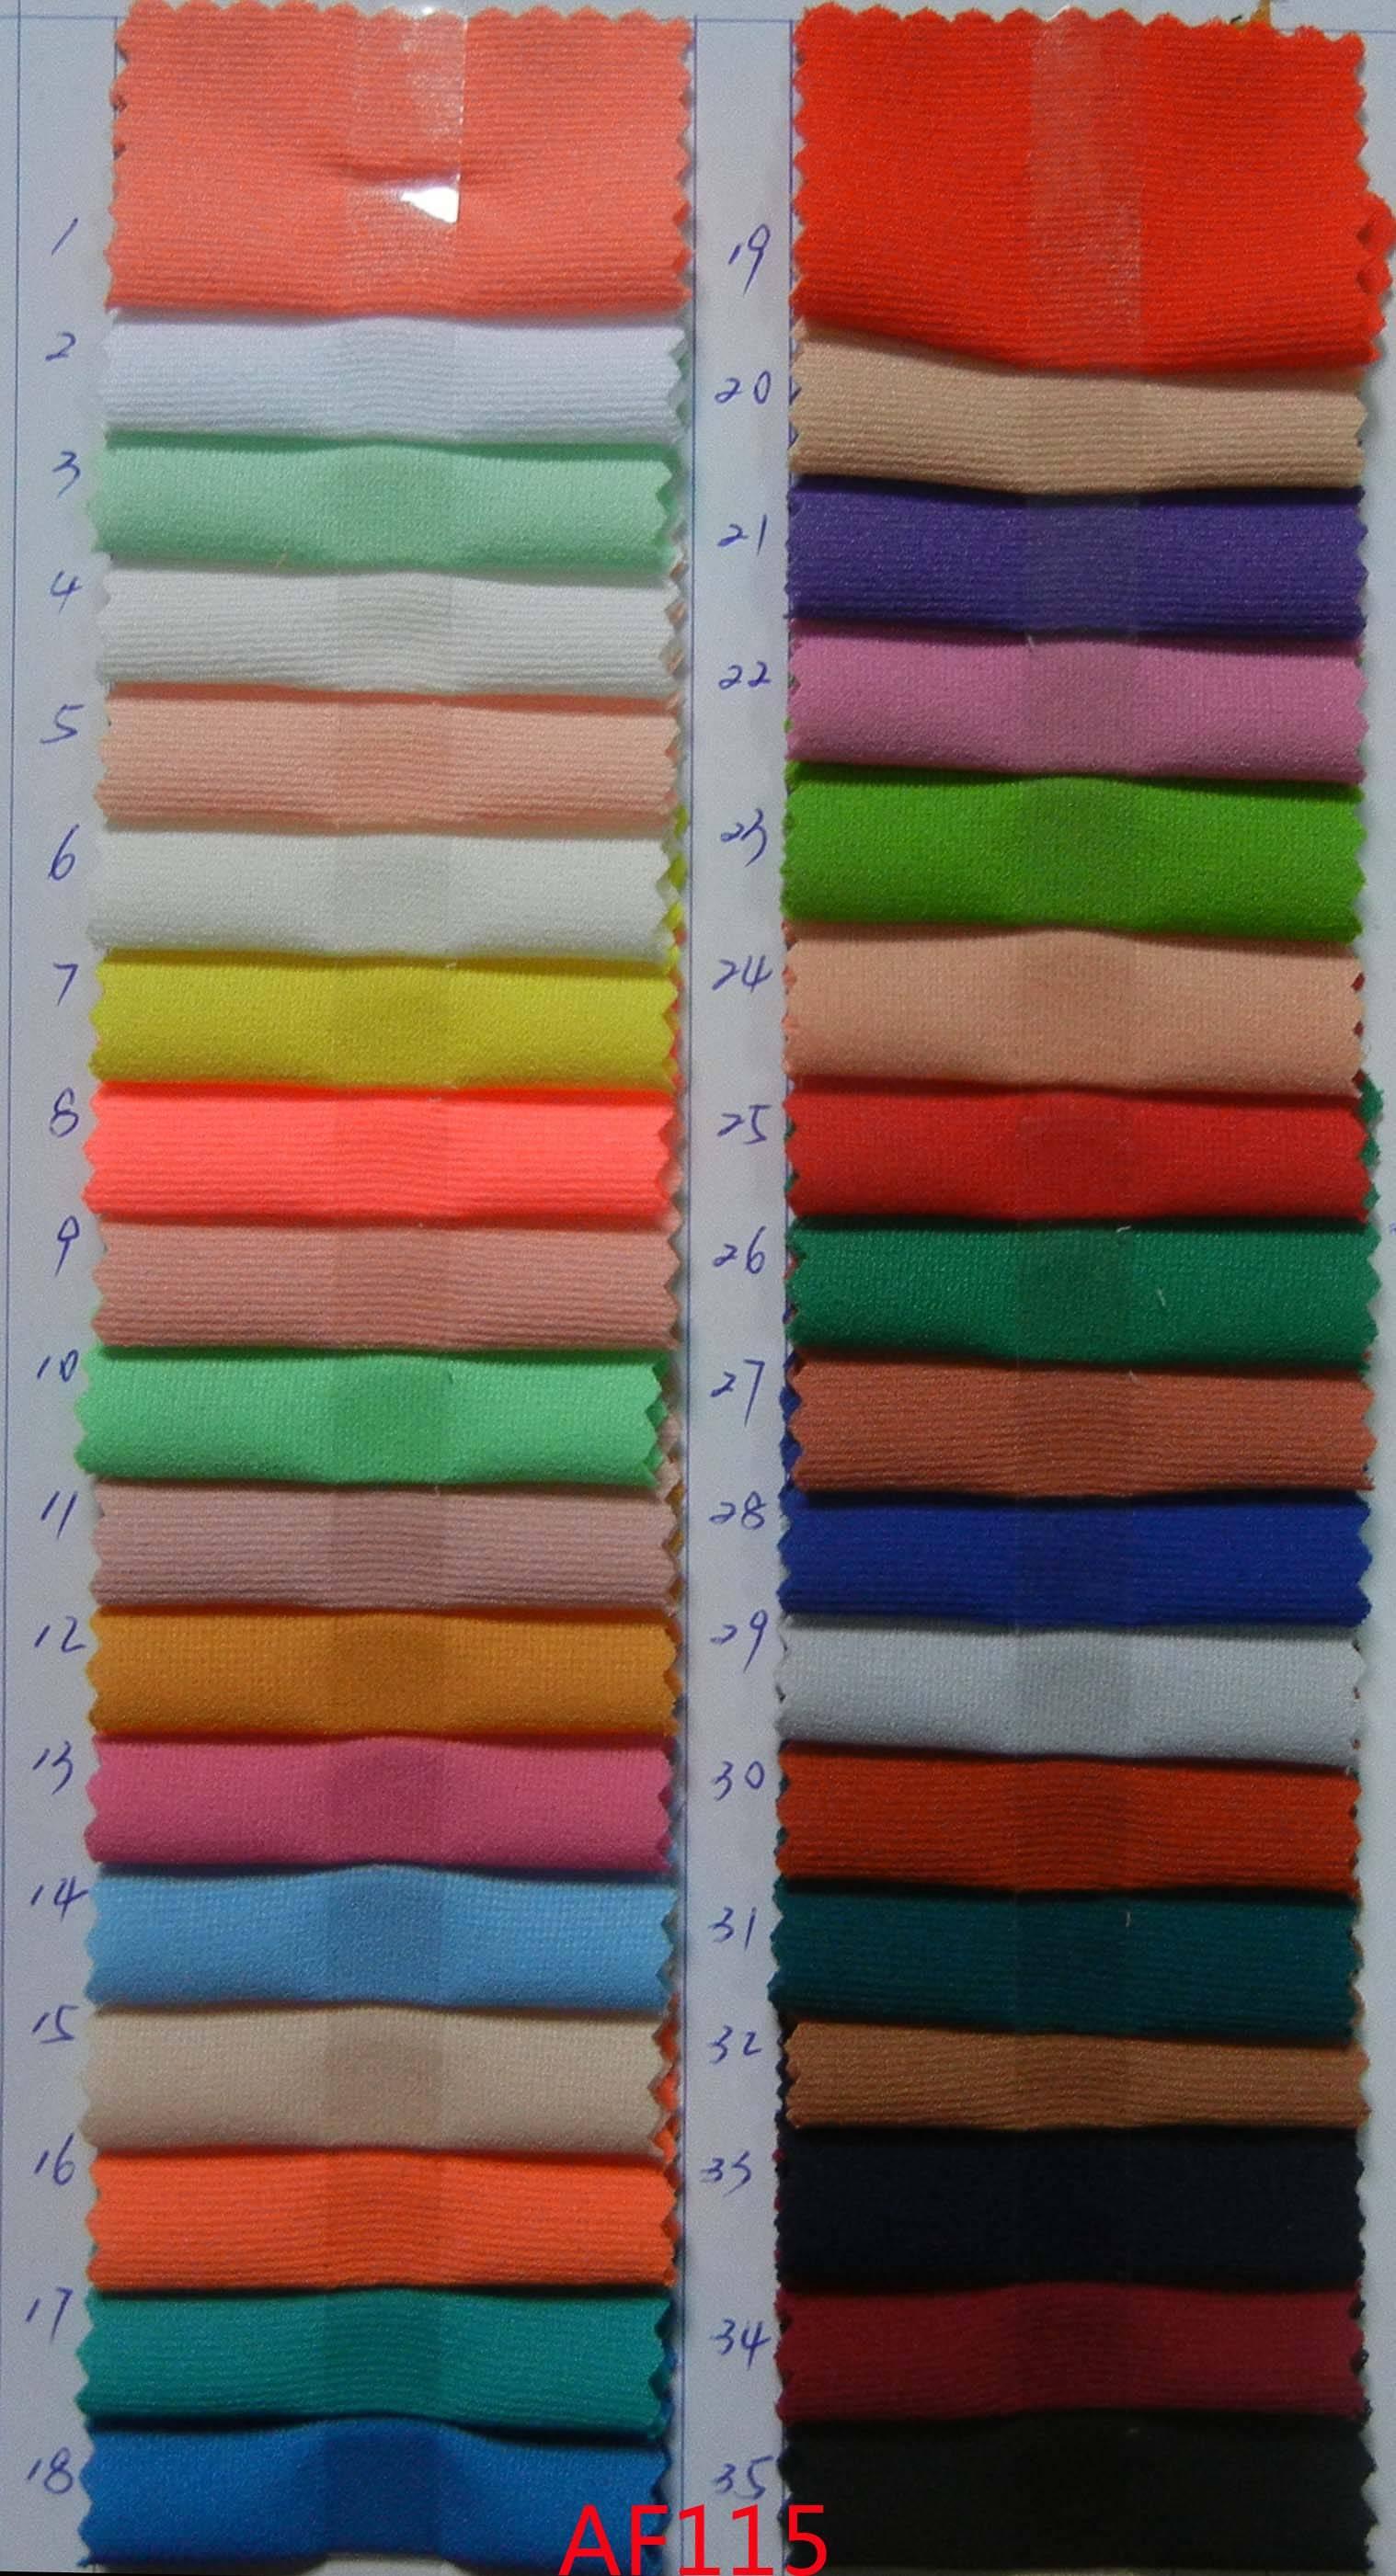 AF113 100% Polyester Plain Chiffon